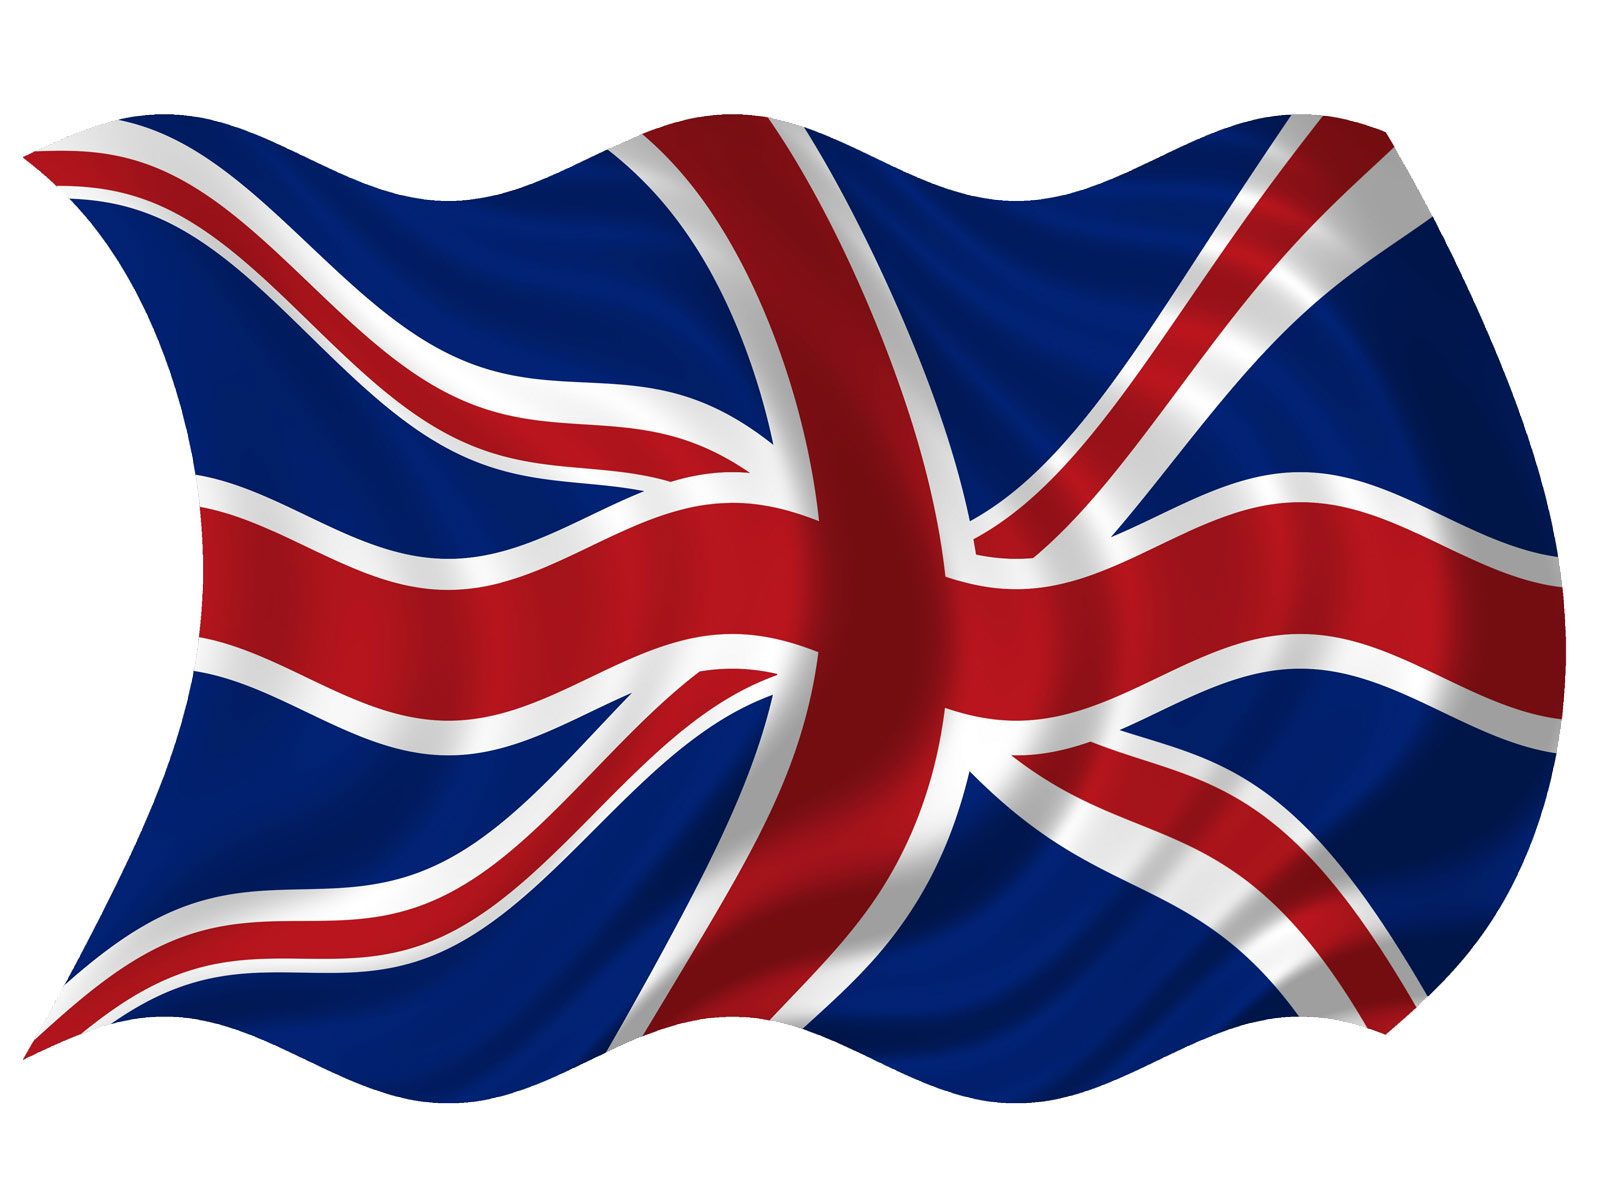 1600x1200 London Clipart London Flag Clipart